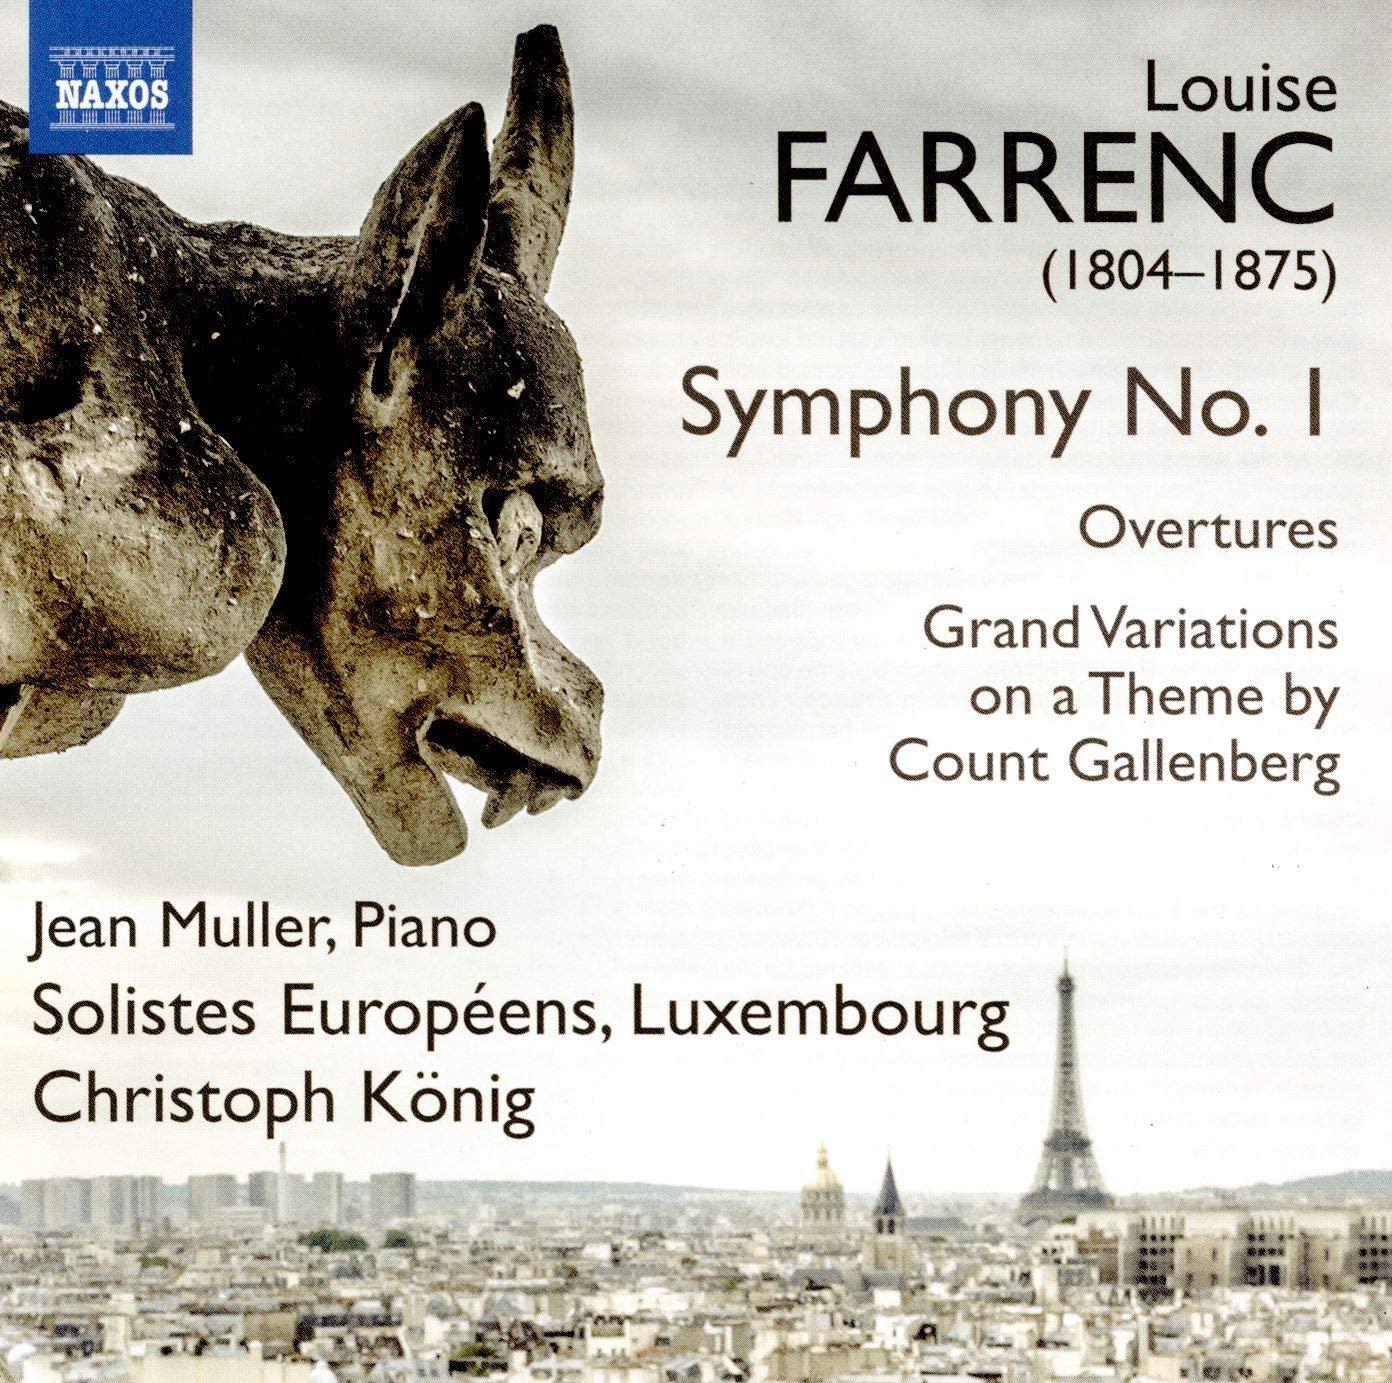 Review of FARRENC Symphony No 1 (König)